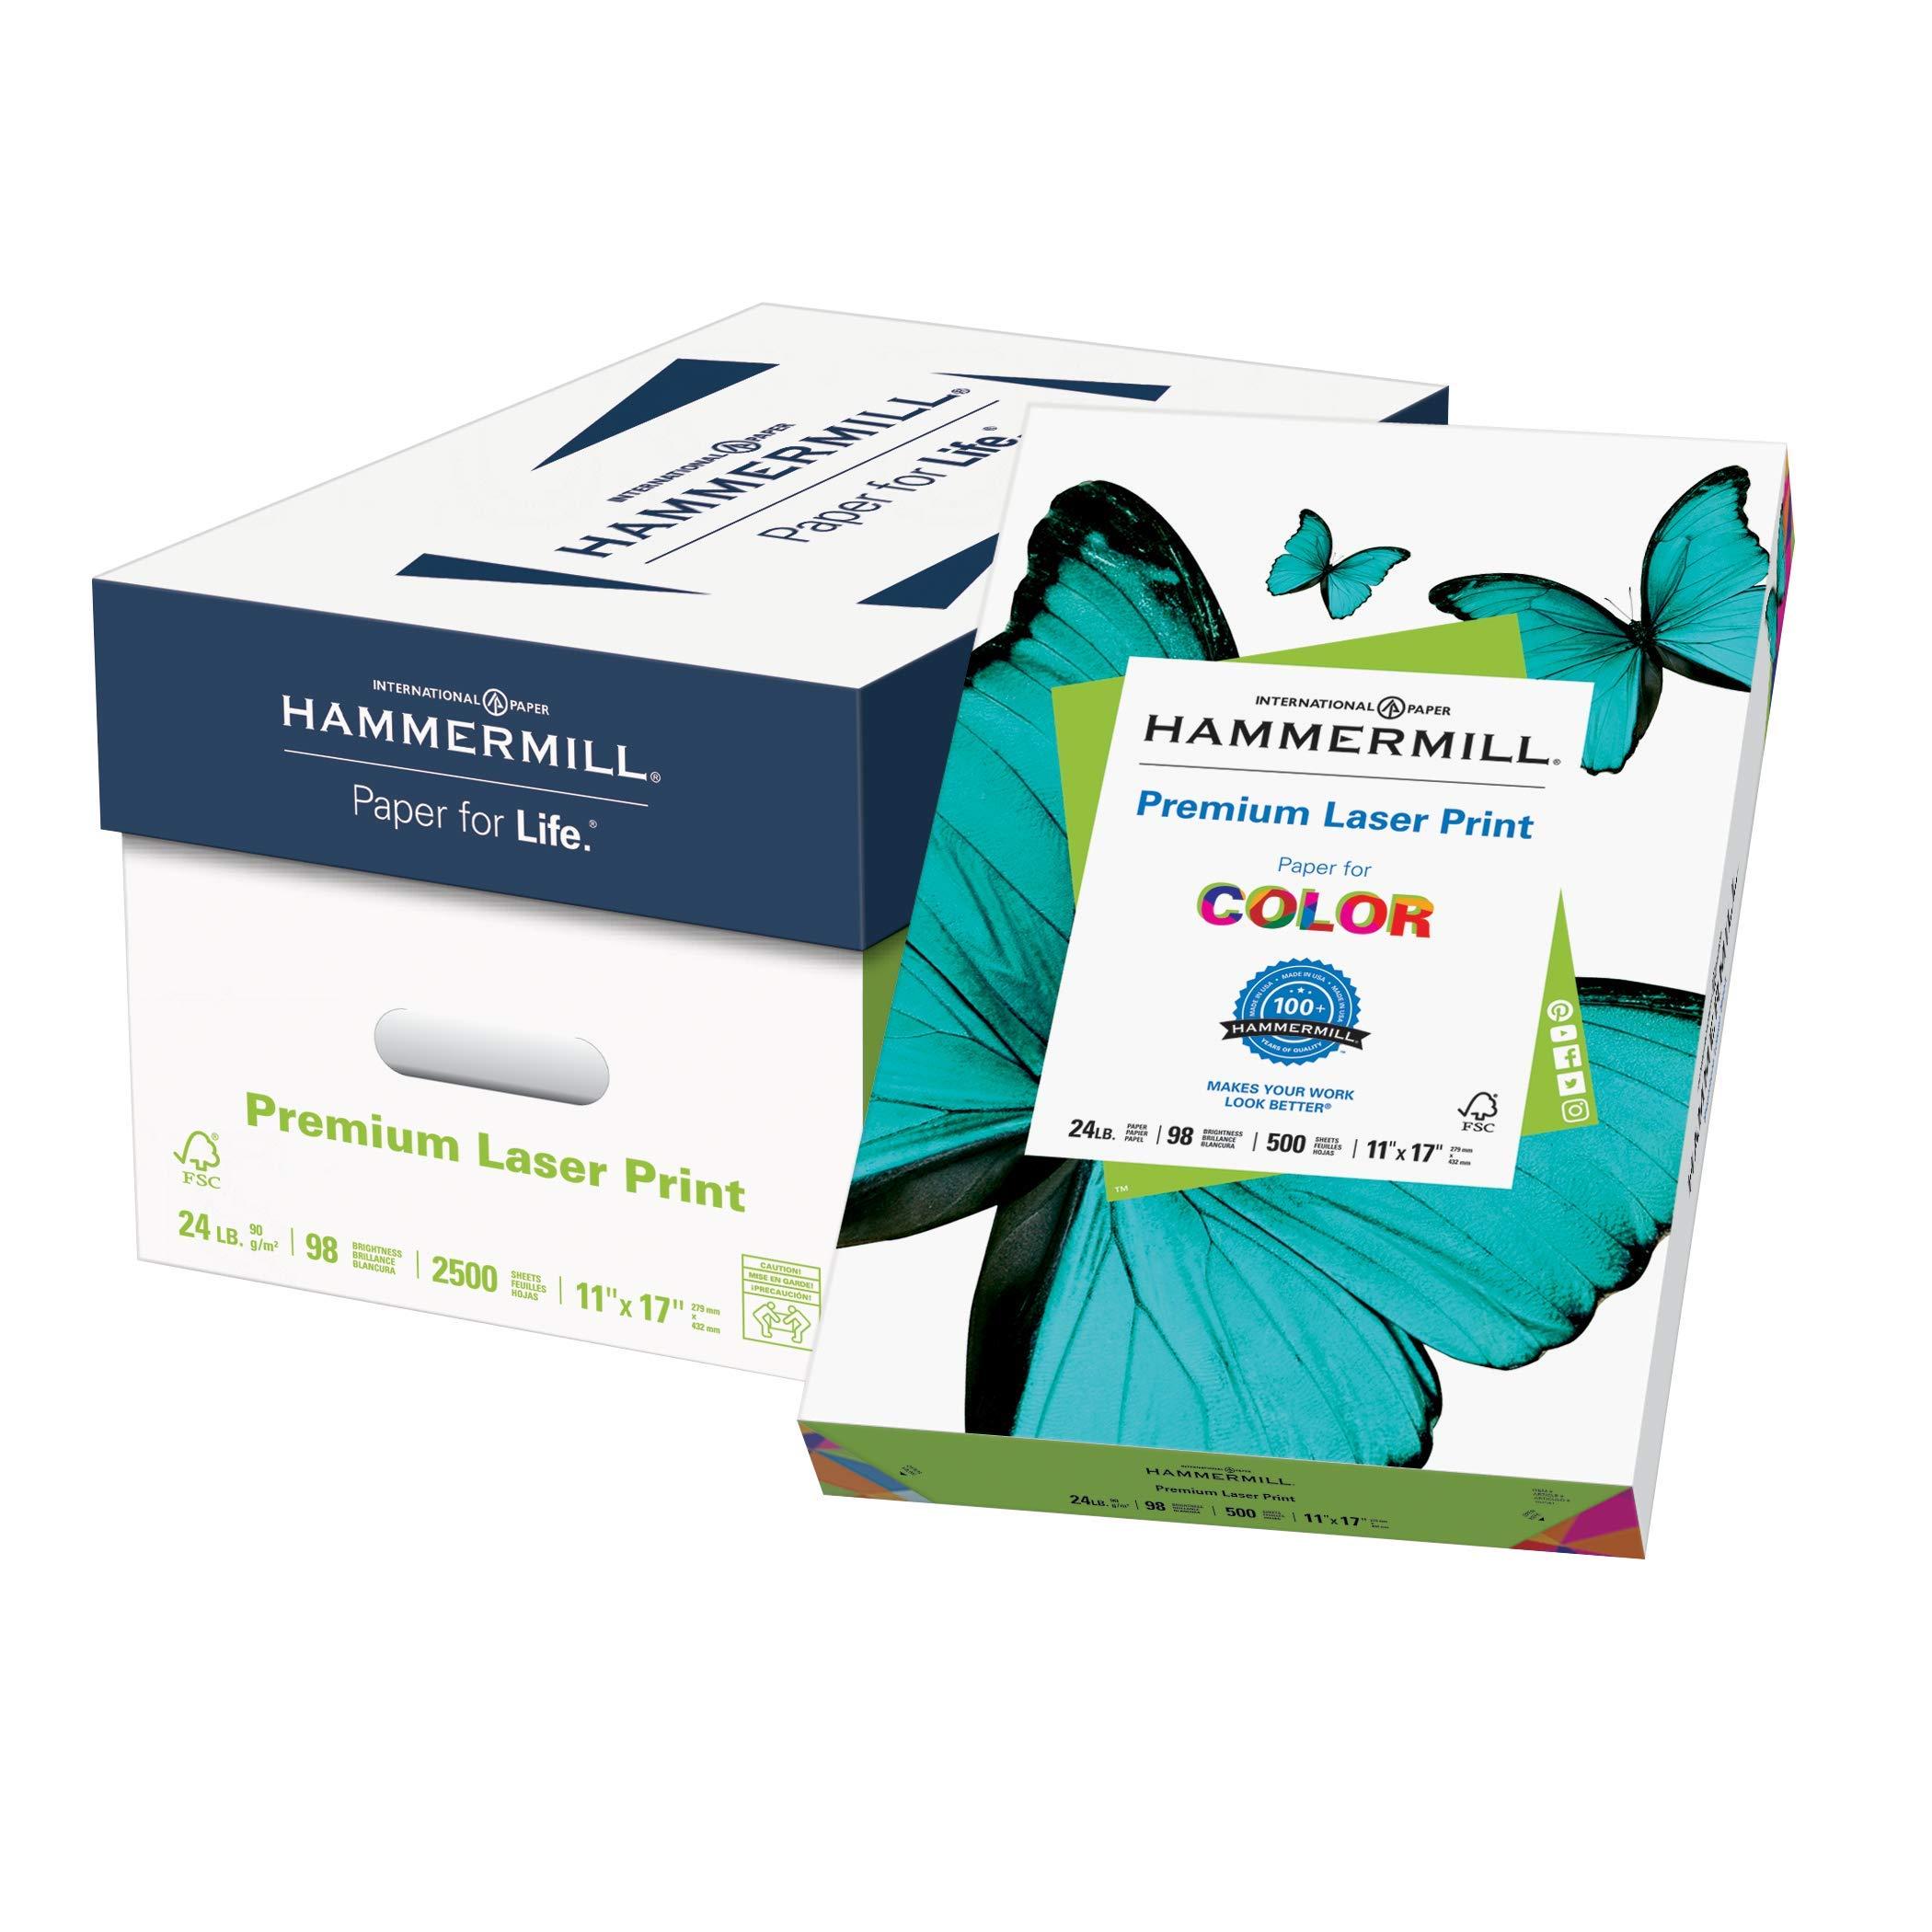 Hammermill Paper, Premium Laser Print Paper, 11 x 17 Paper, Ledger Size, 24lb Paper, 98 Bright, 5 Reams / 2,500 Sheets (104620C) Acid Free Paper